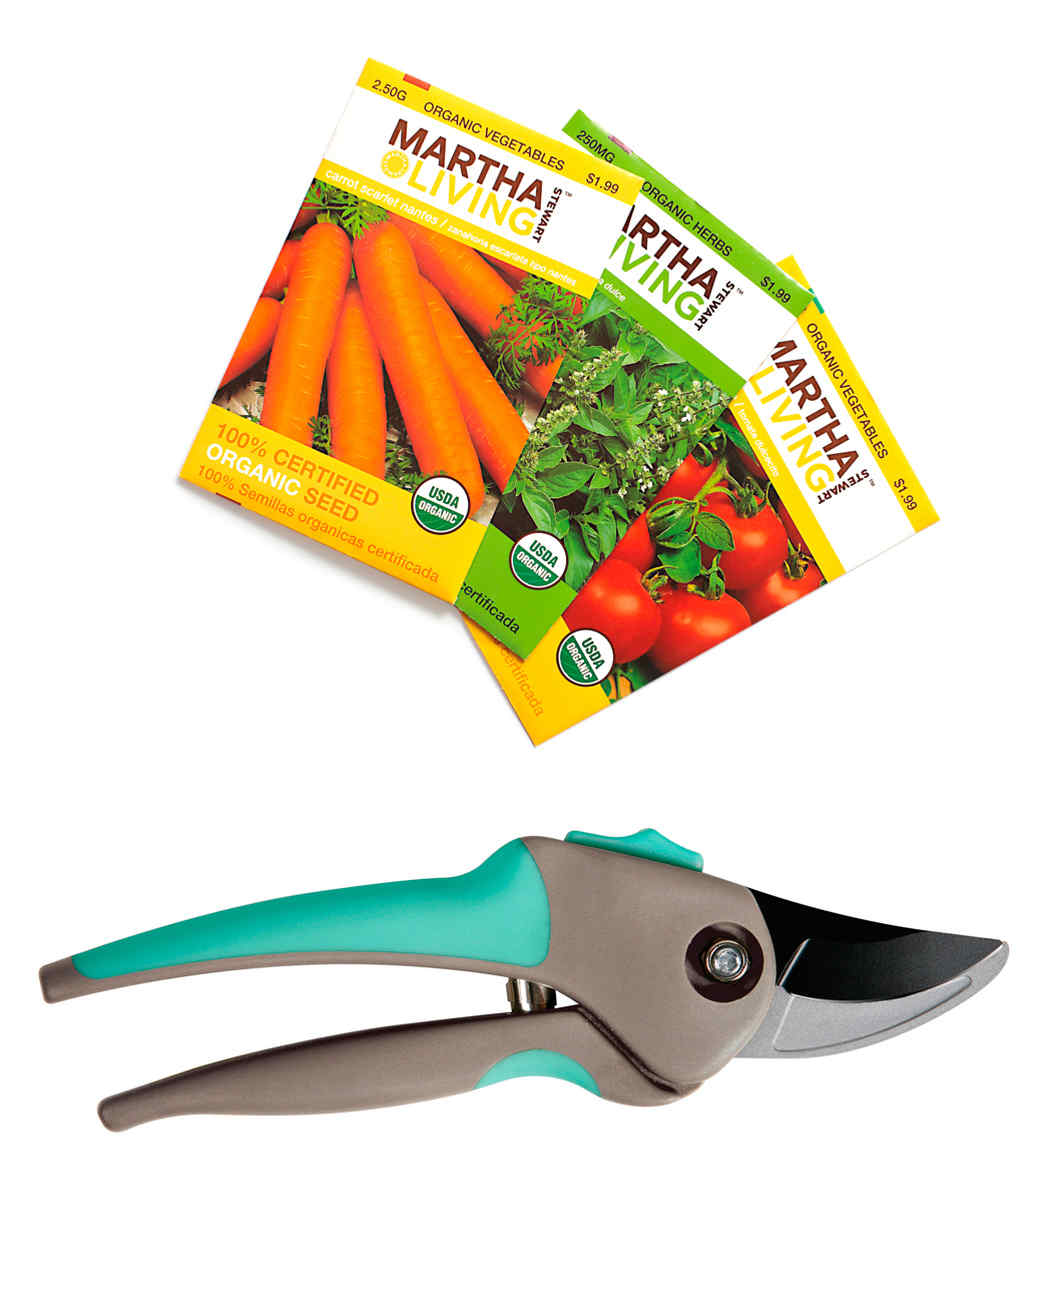 pruner-seeds-mrkt-1112.jpg